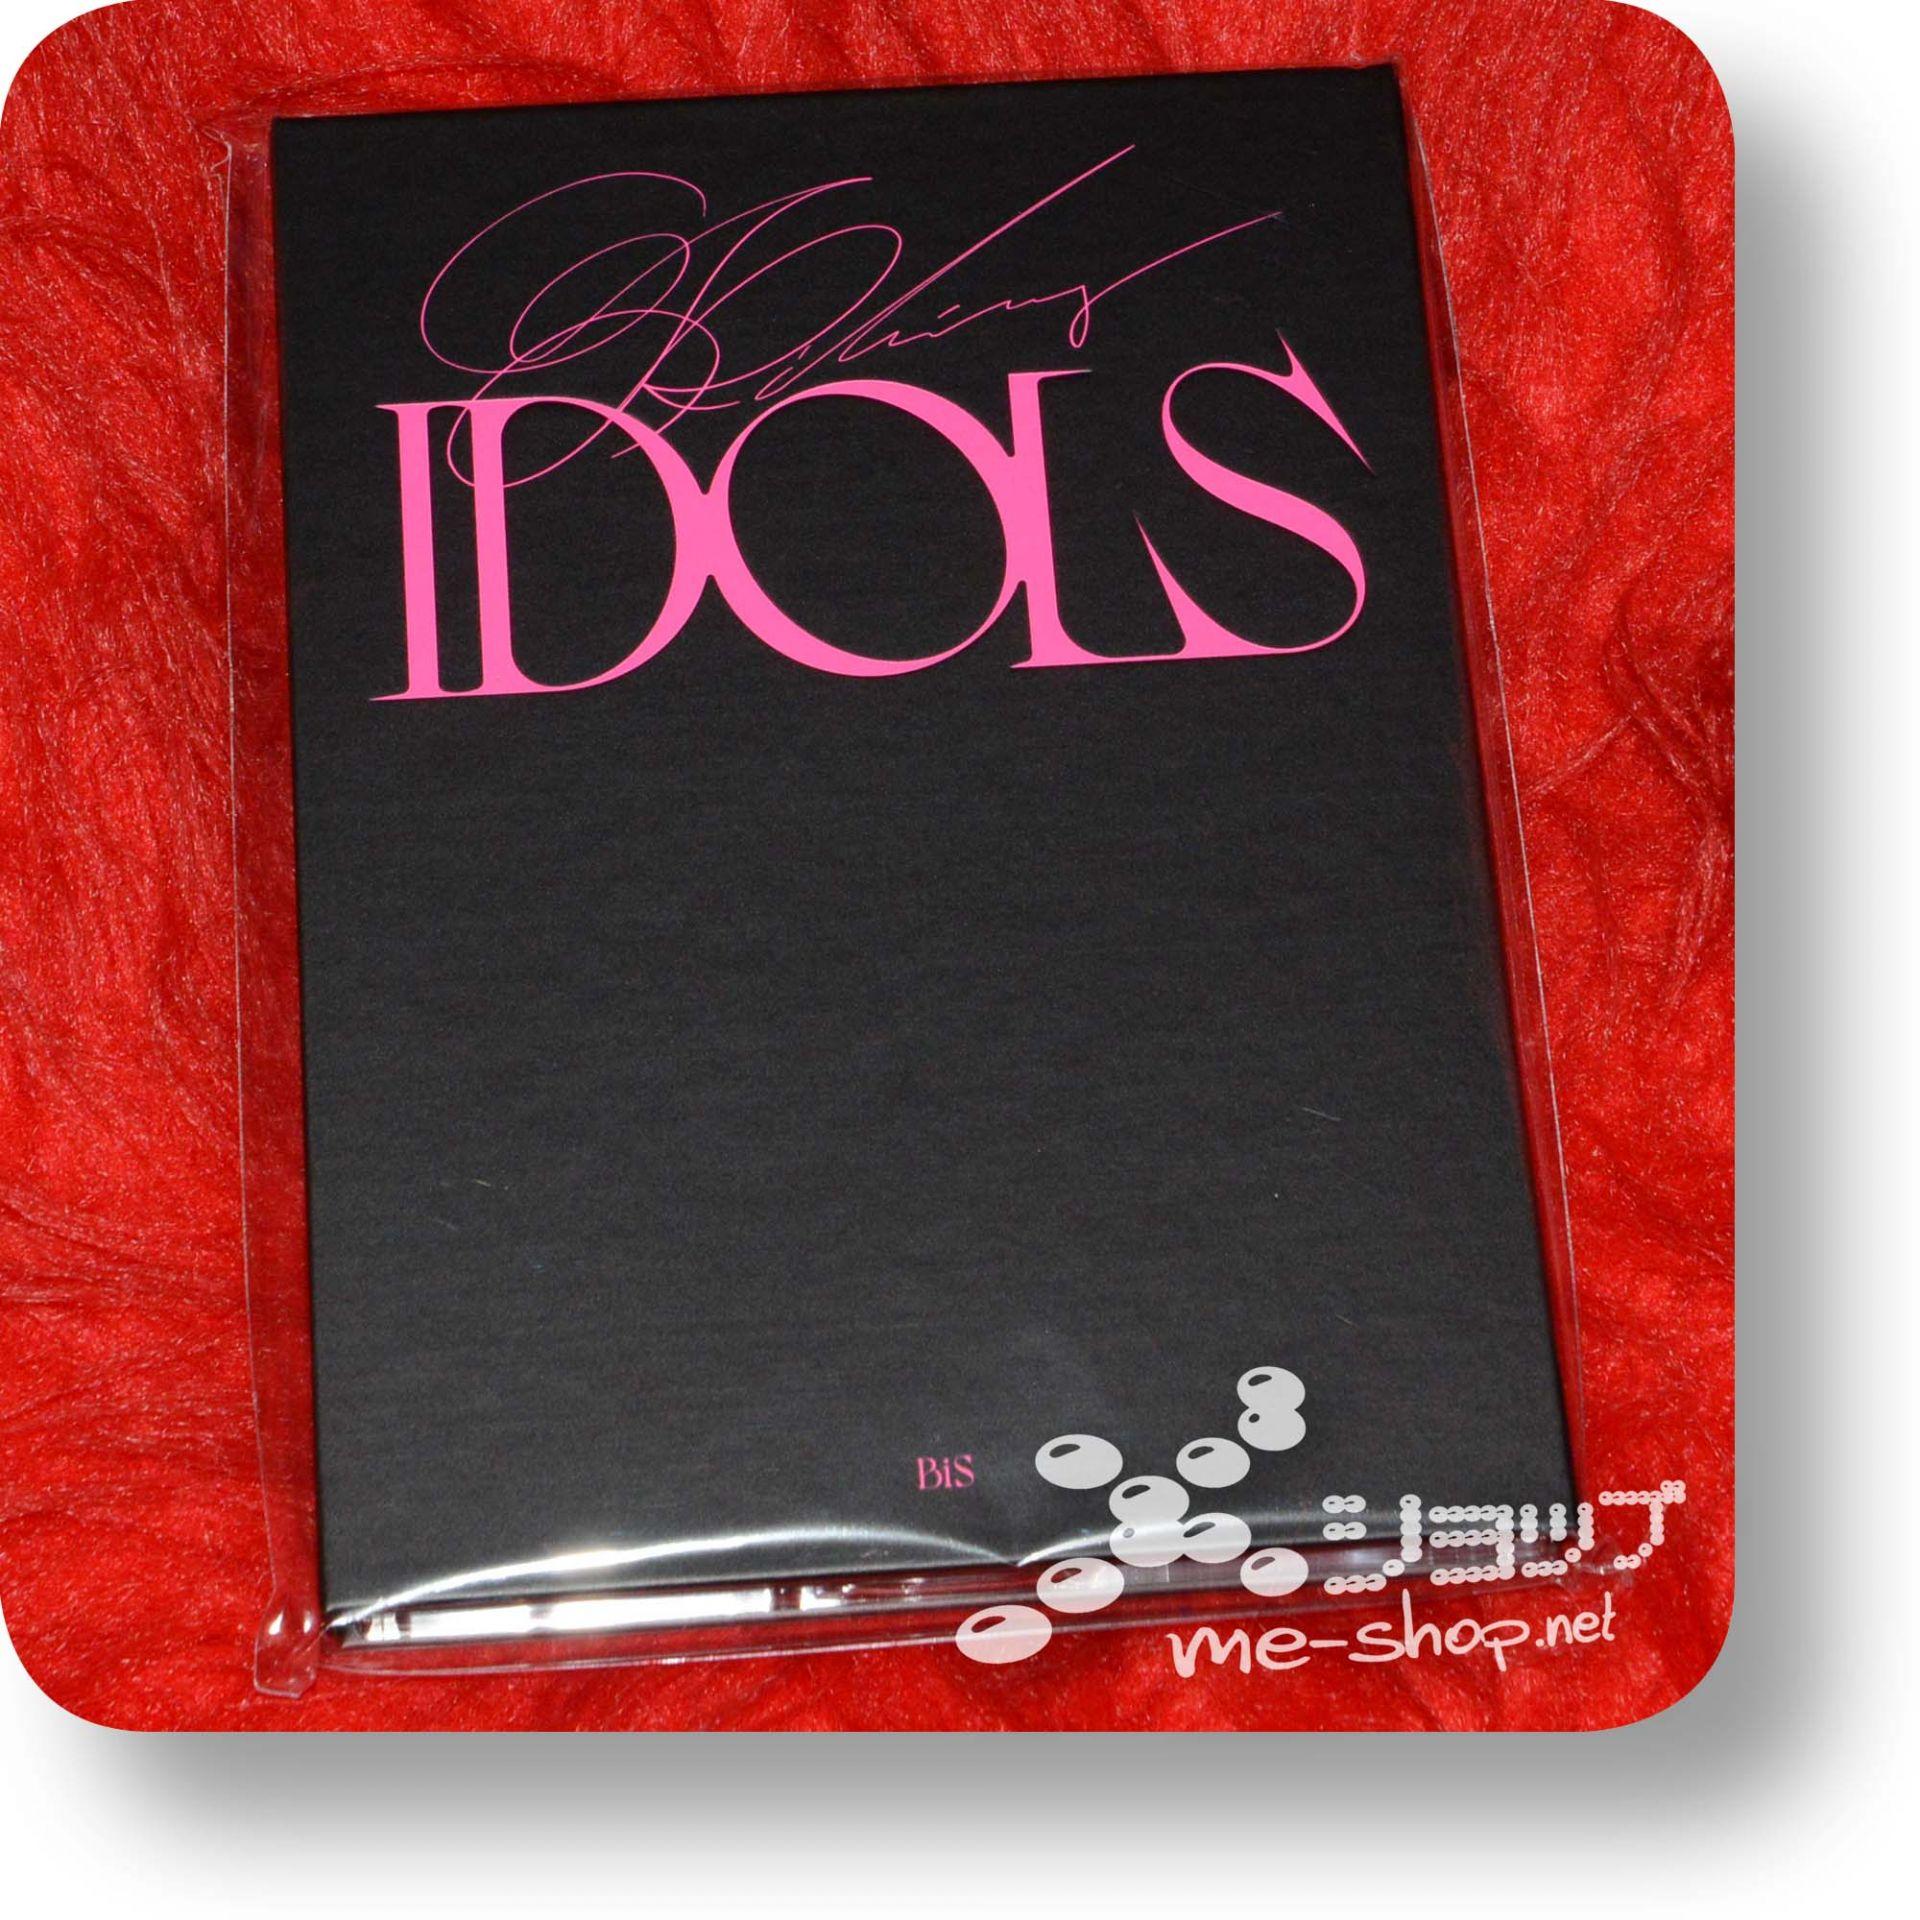 bis killing idols lim